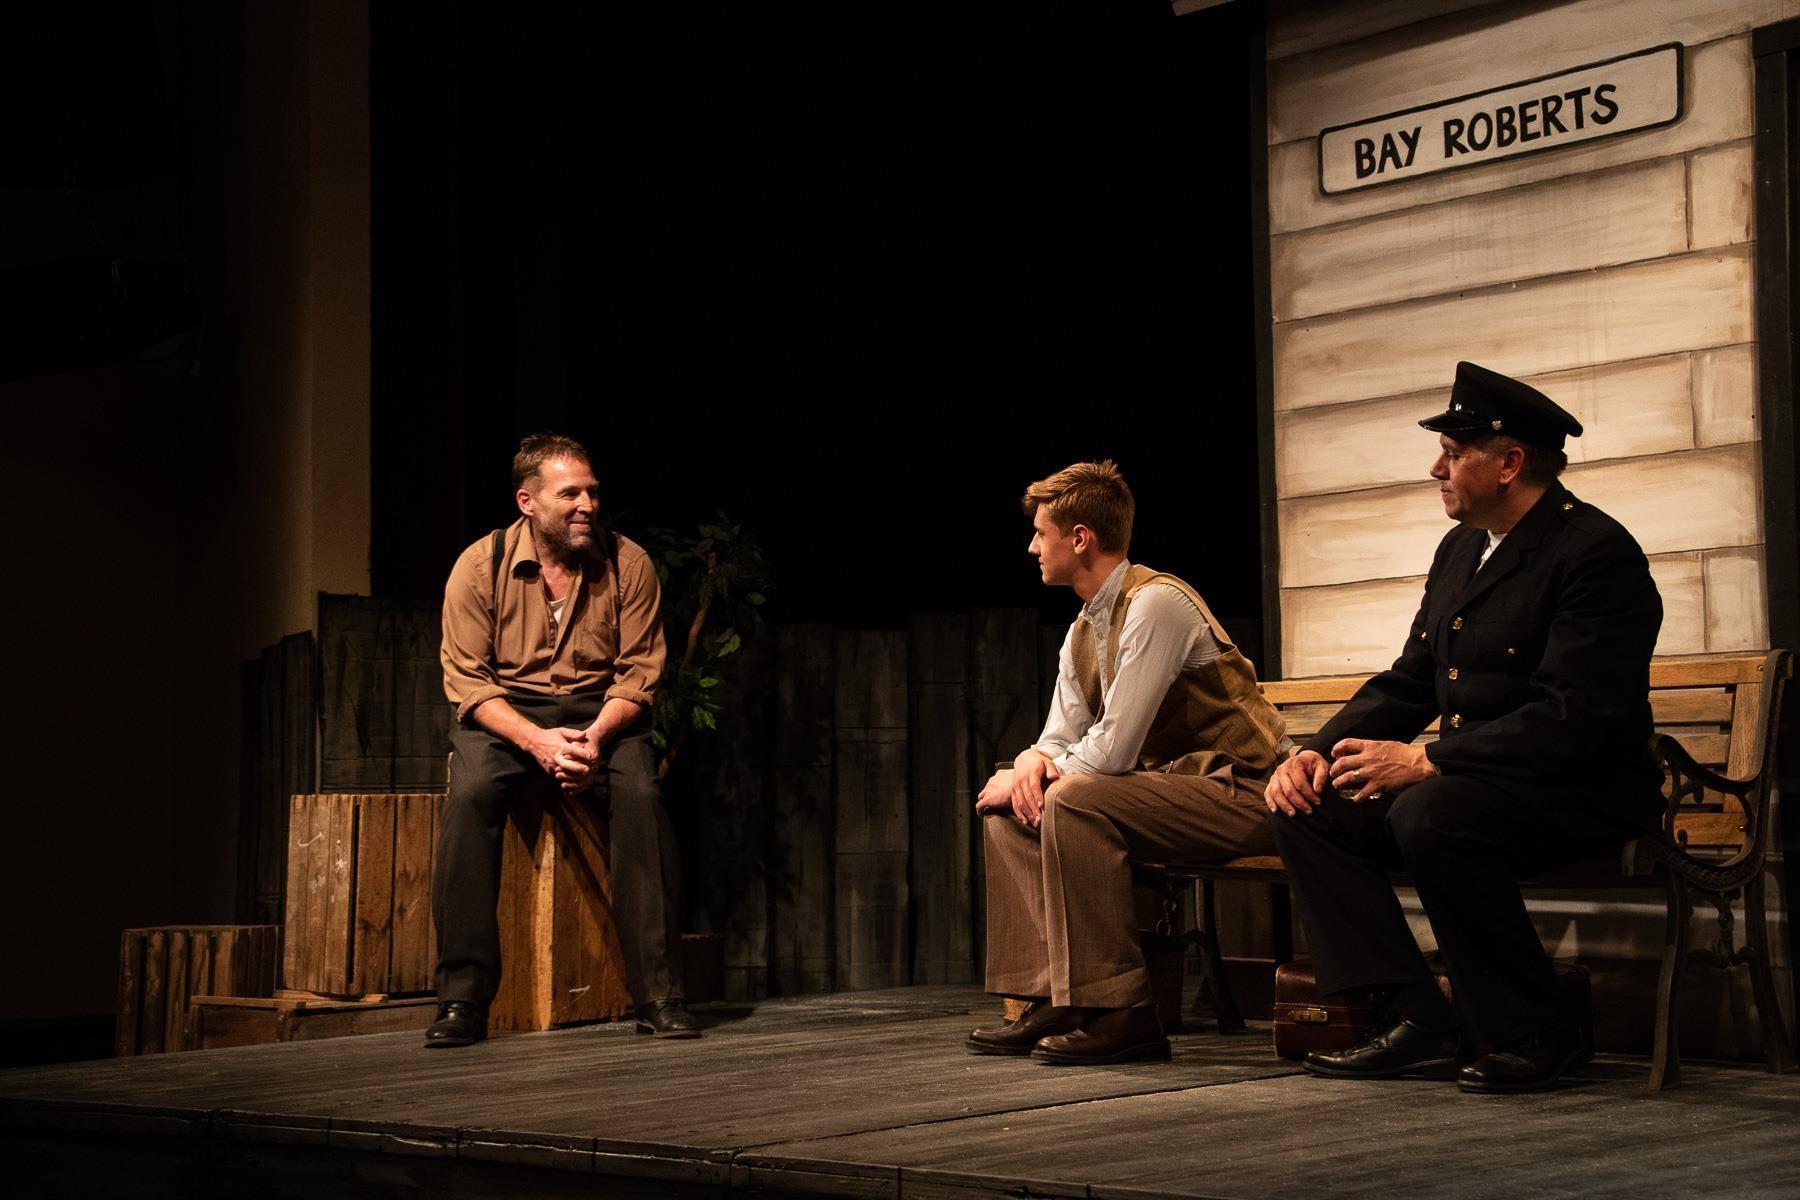 L - R: Bryan Mailey, Hayden Lysecki, Glen Warren. Photo by Jonathan van Bilsen.